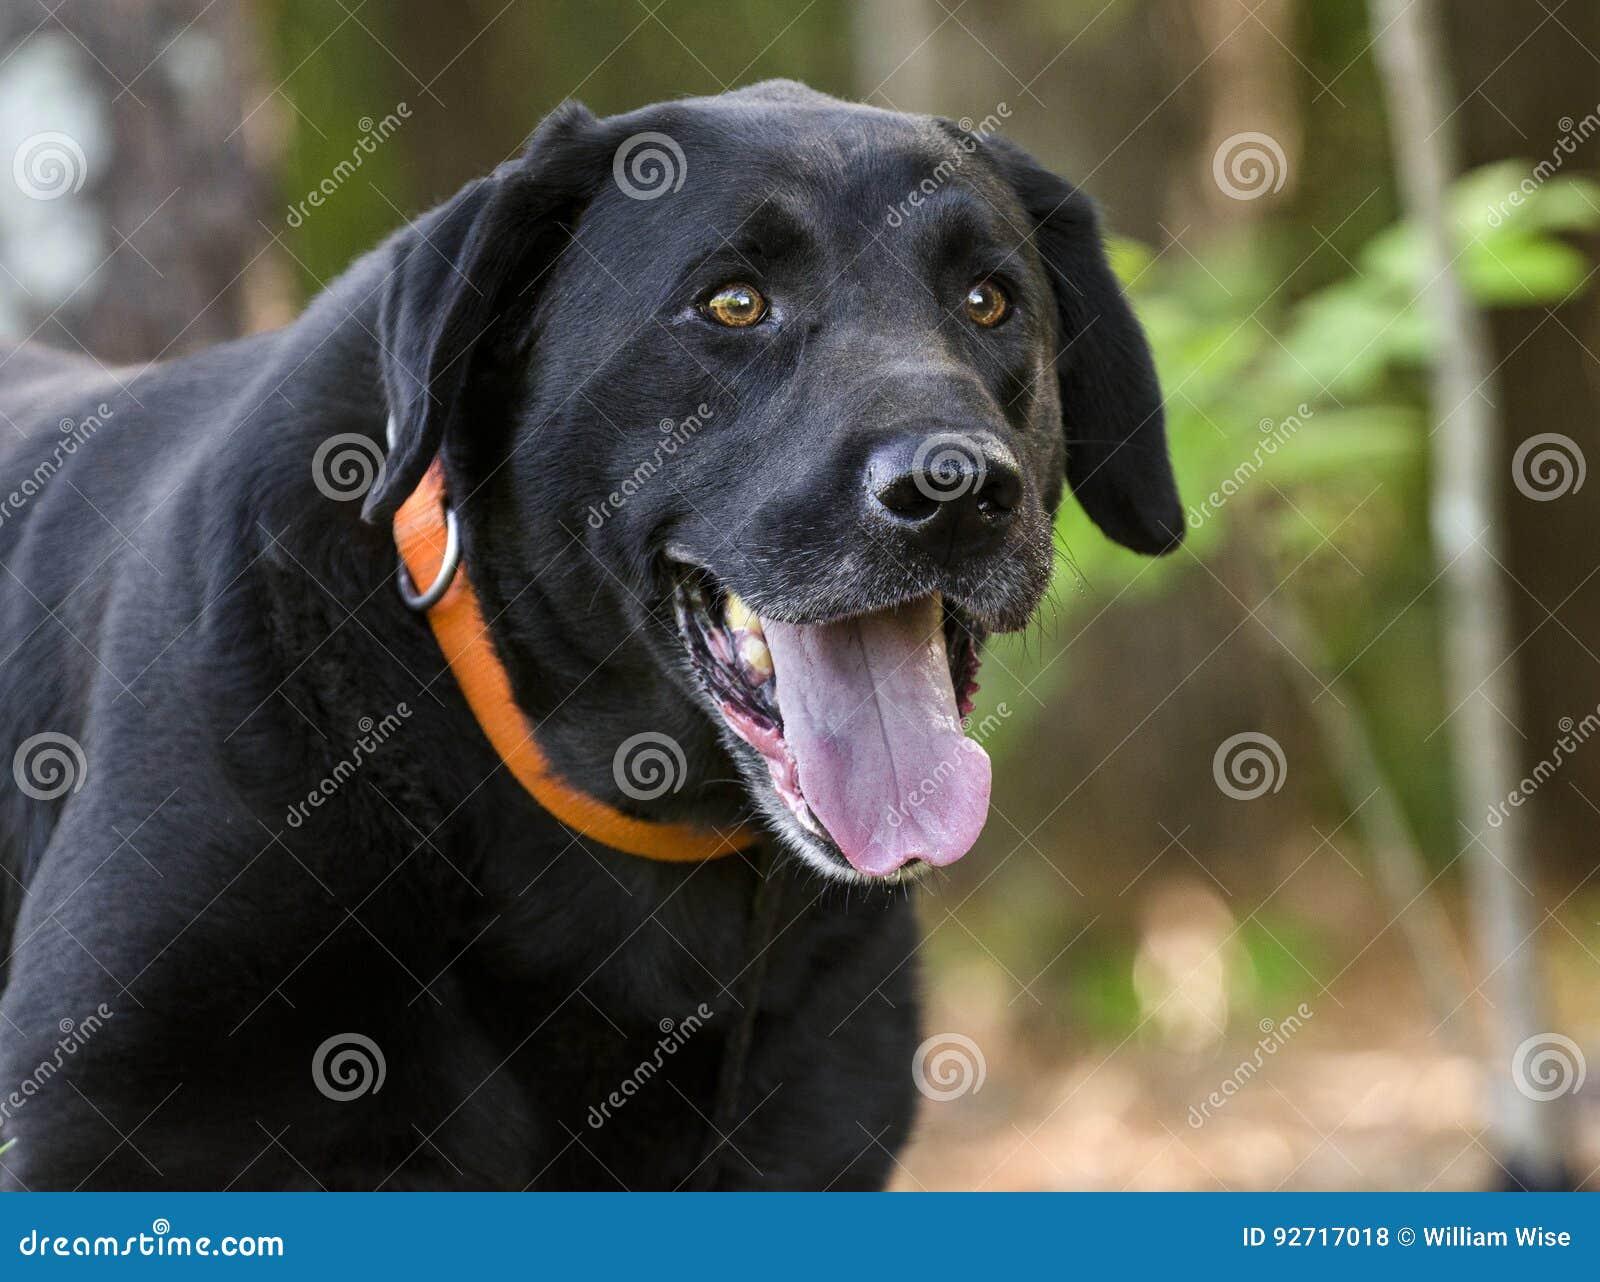 Black Labrador Retriever Dog Stock Photo - Image of brown, happy ... for Black Lab Dog Male  54lyp